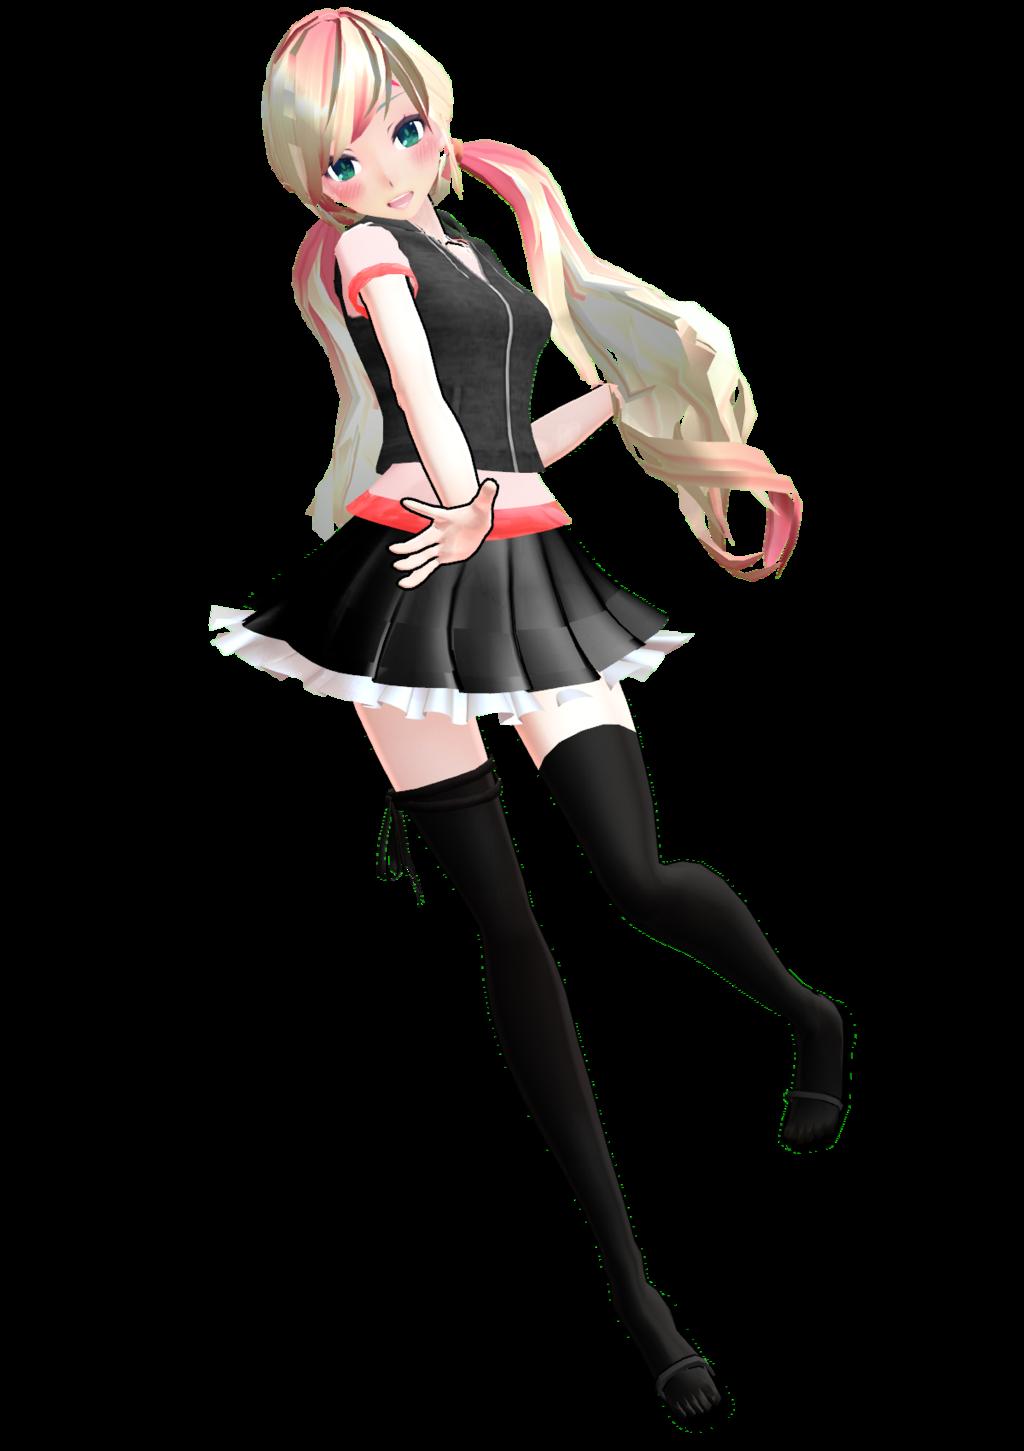 Mmd dress models download by hikariwakamiya on deviantart - _mmd__model___nowy___dl_by_kuma_shii D7tt439 Png 1024 1451